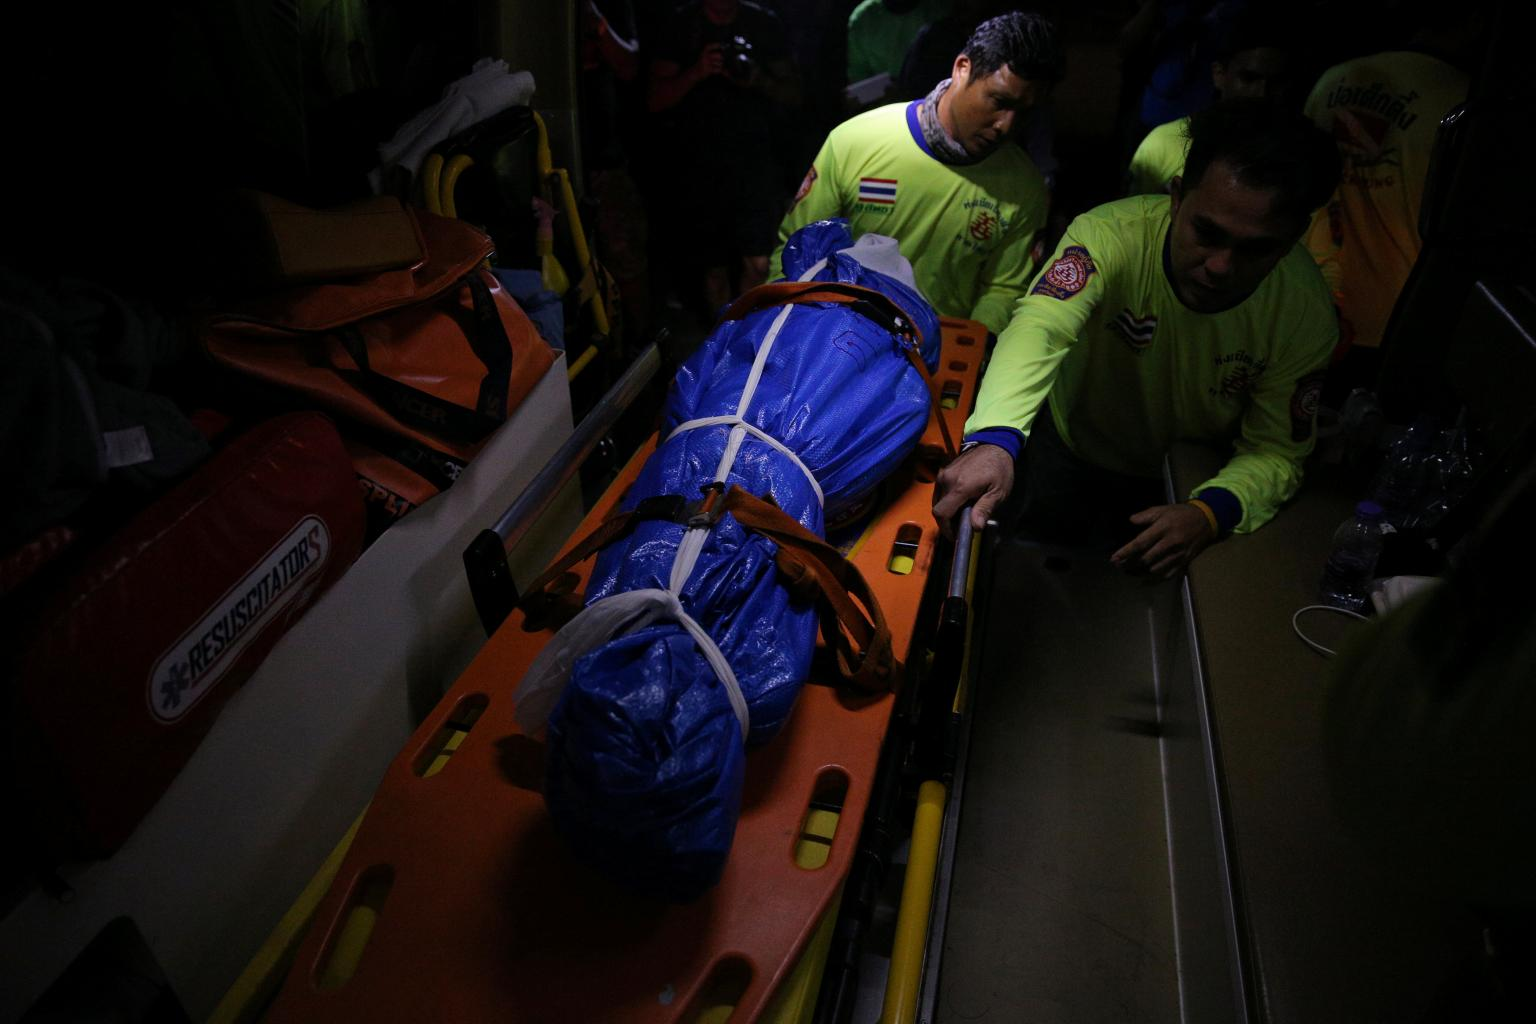 Thai rescuers prepare to raise sunken tourist boat, 41 confirmed dead